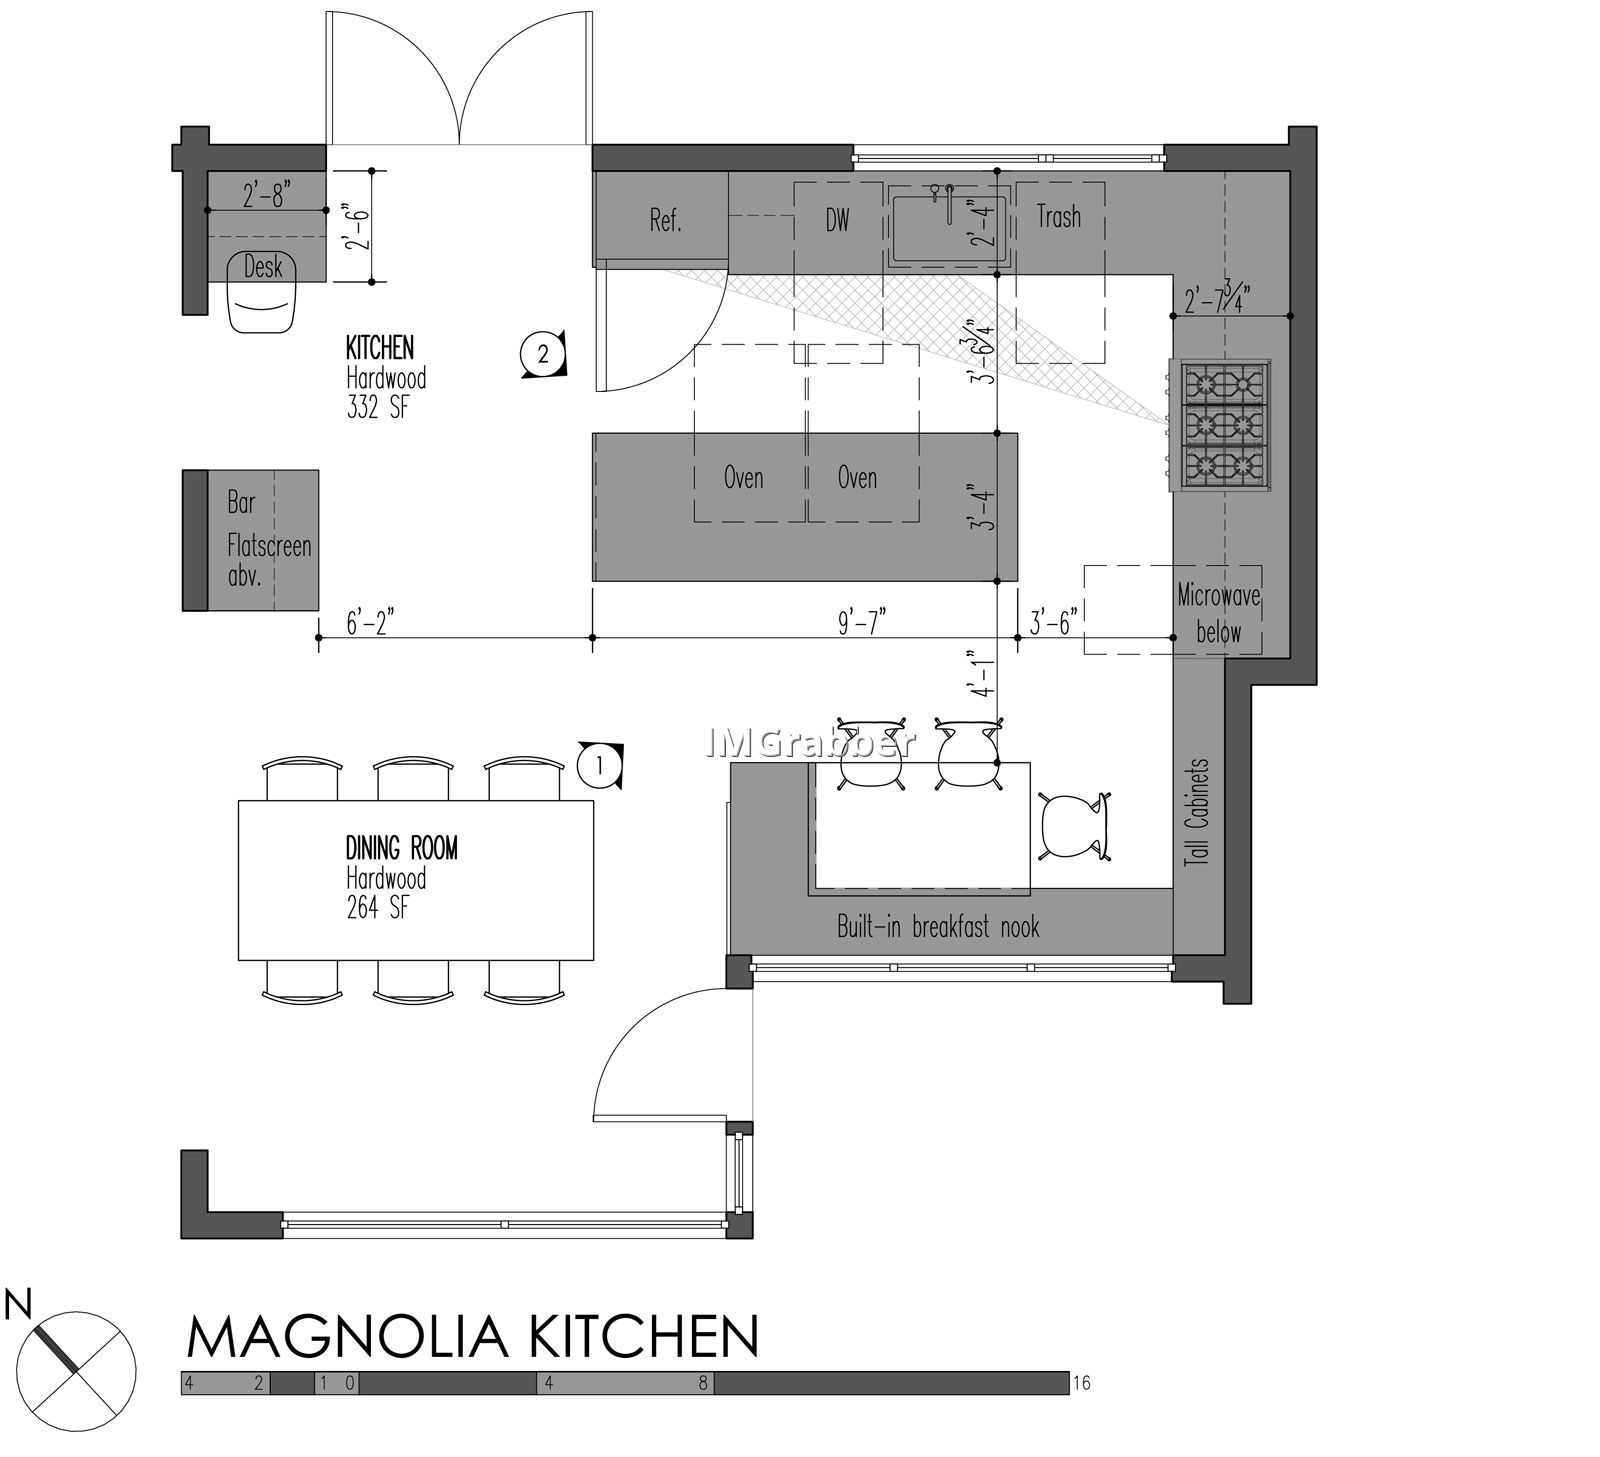 Kitchen Island Dimensions